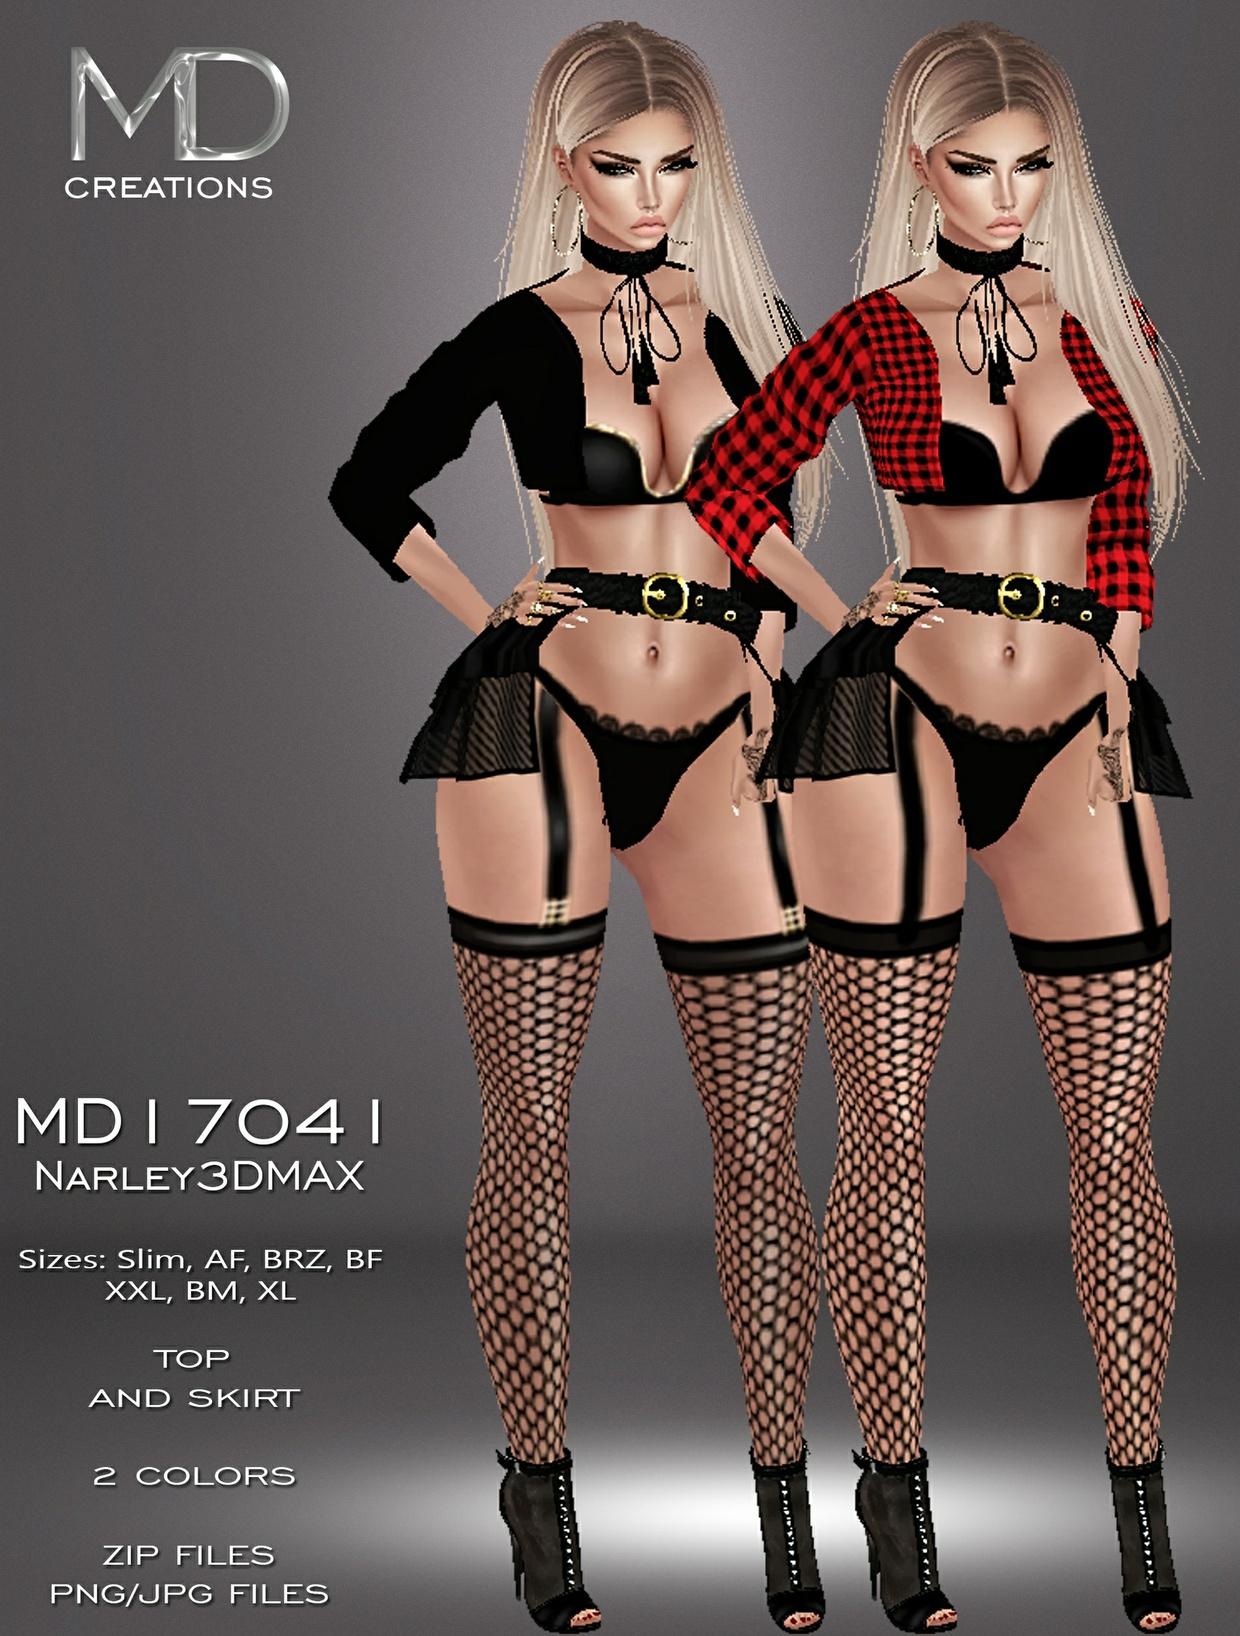 MD17041 - Narley3DMAX